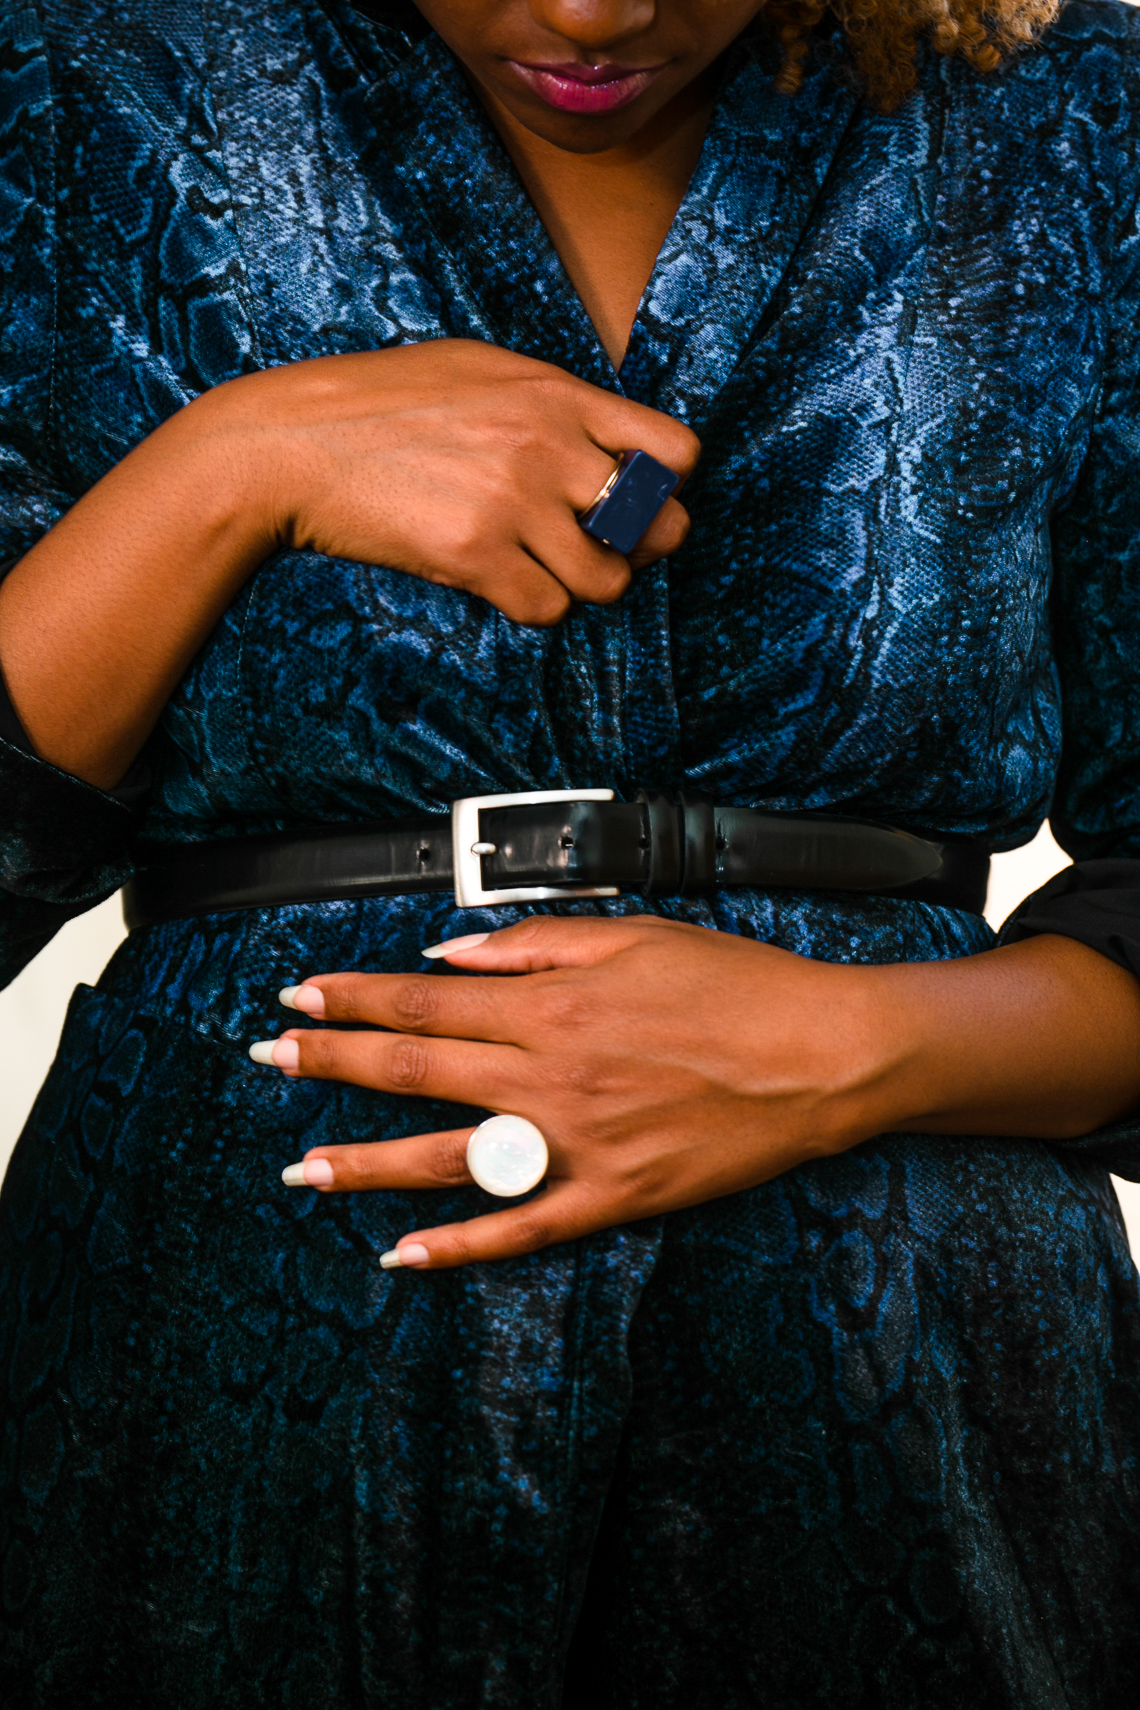 blazer-snake print-how to wear snake print-wear who you are-liveclothesminded-details-blue blazer